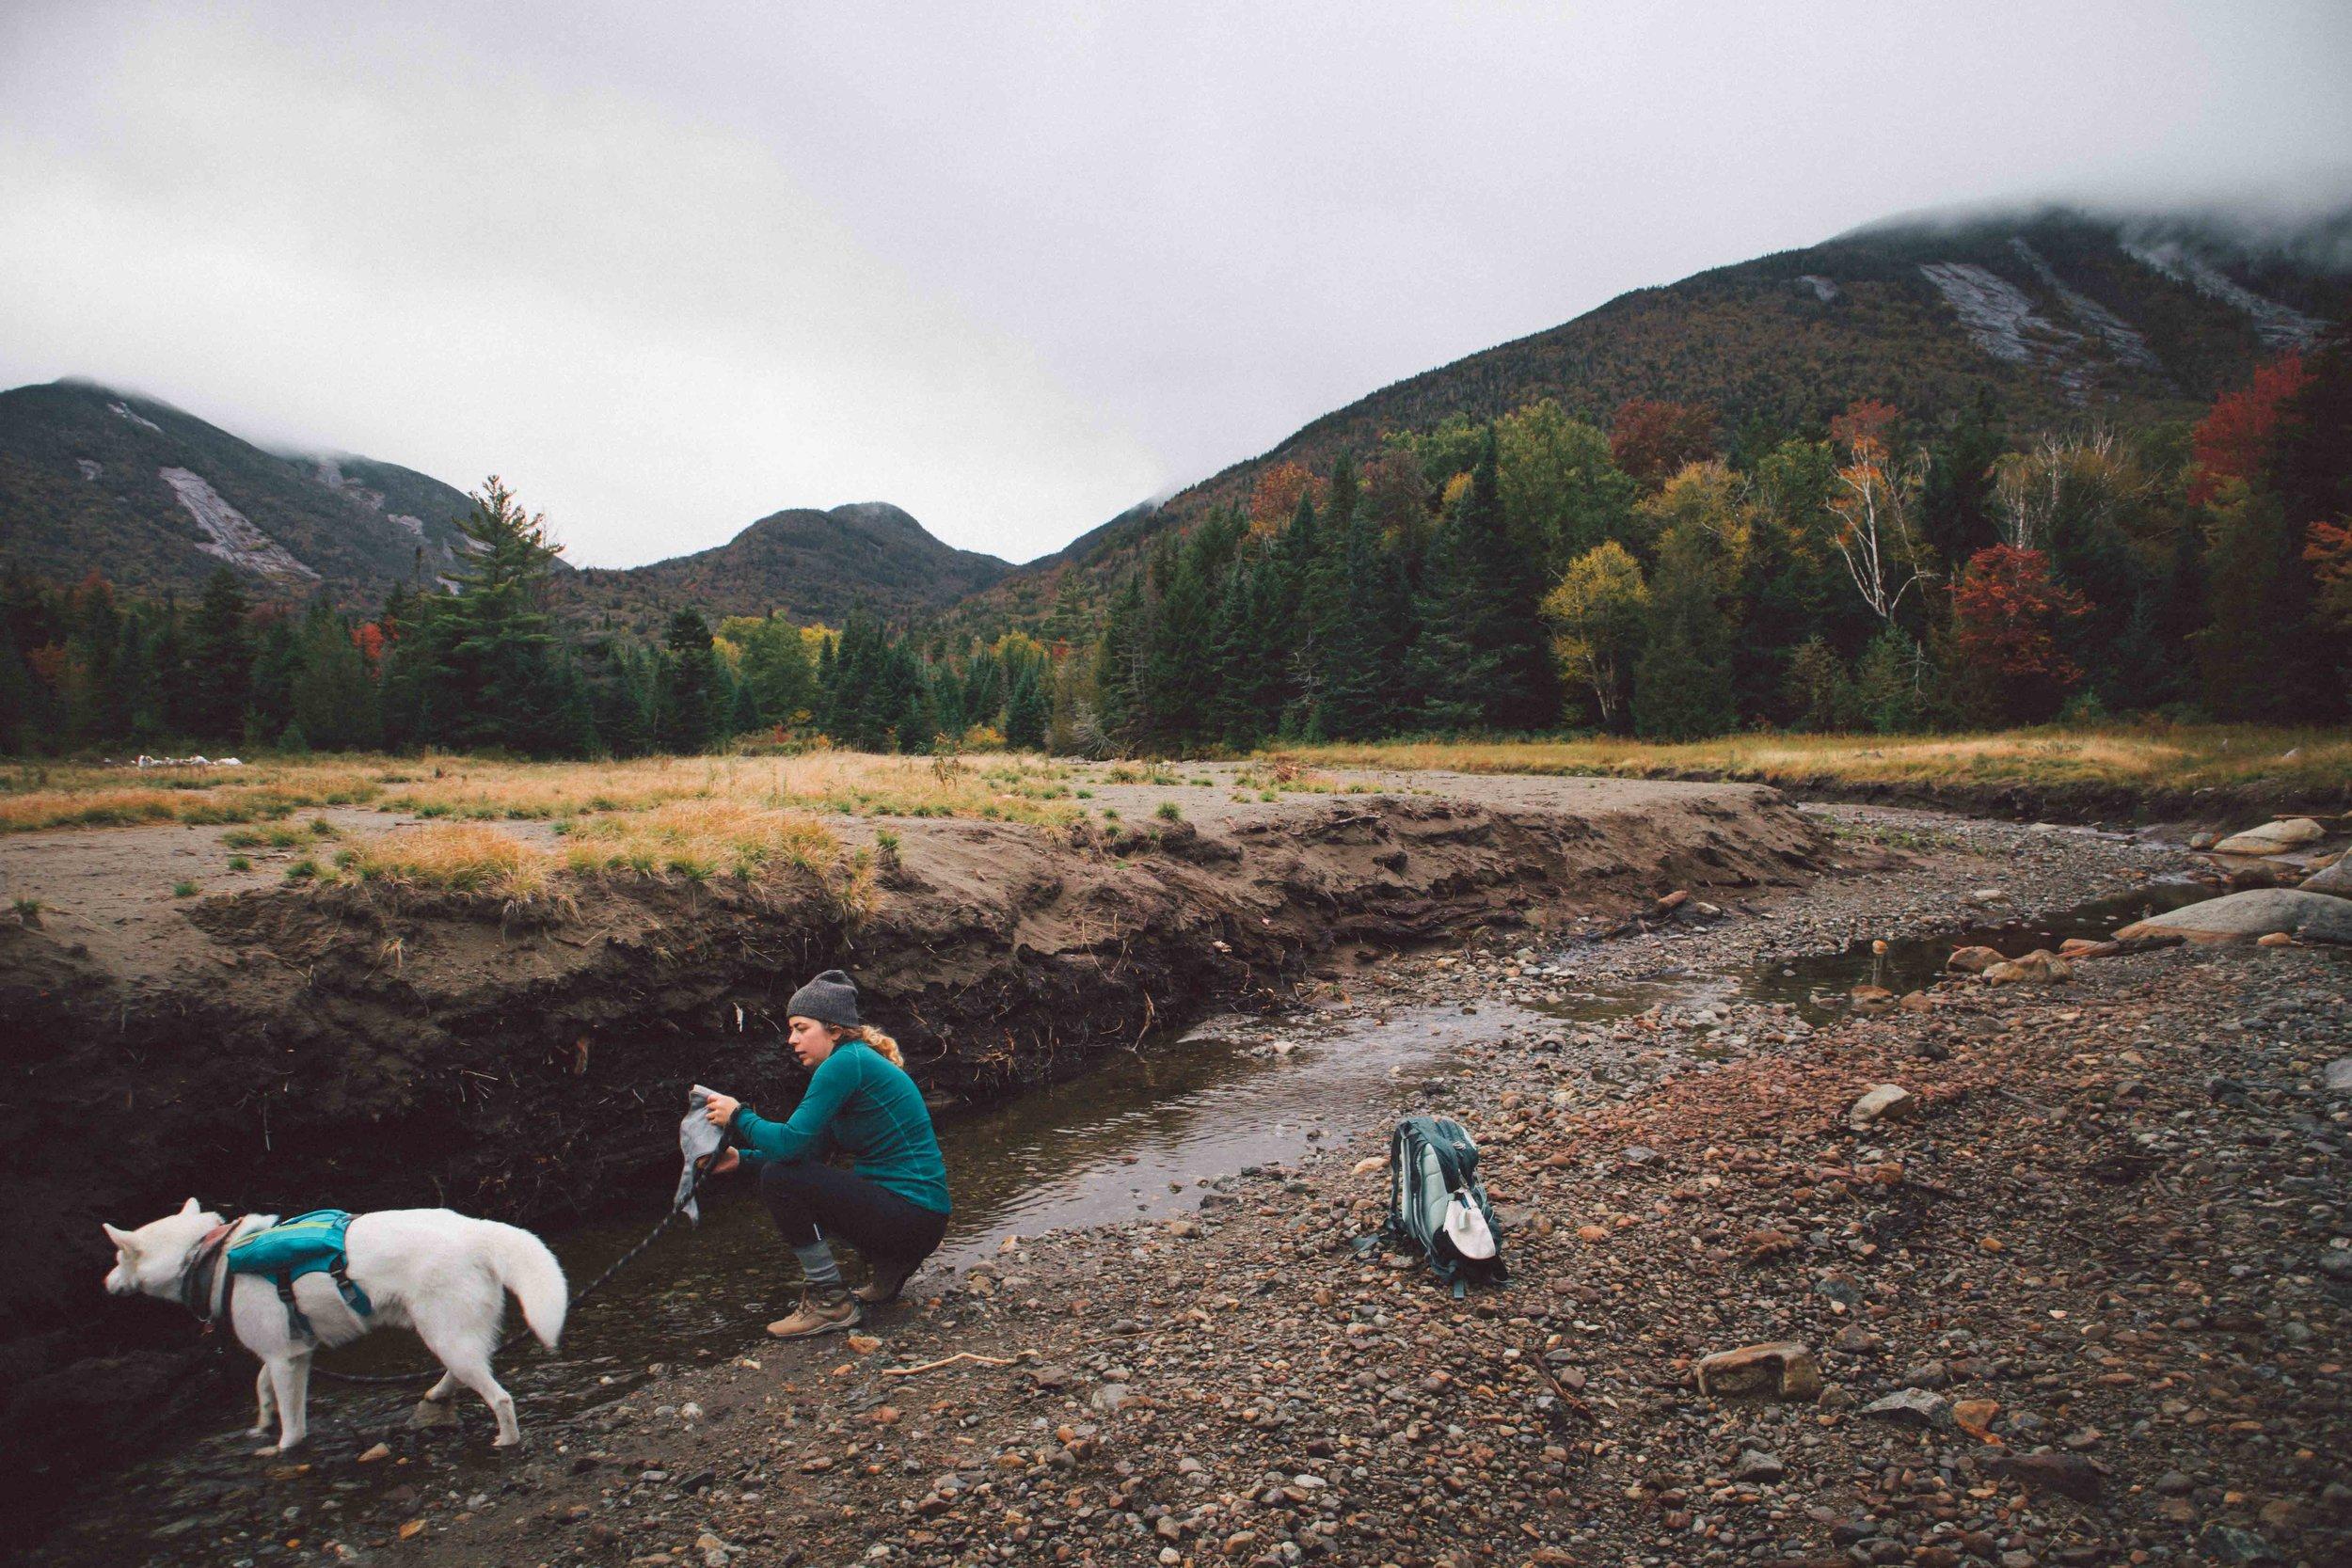 Adirondacks-2018-web-69-Mount-Marcy.jpg